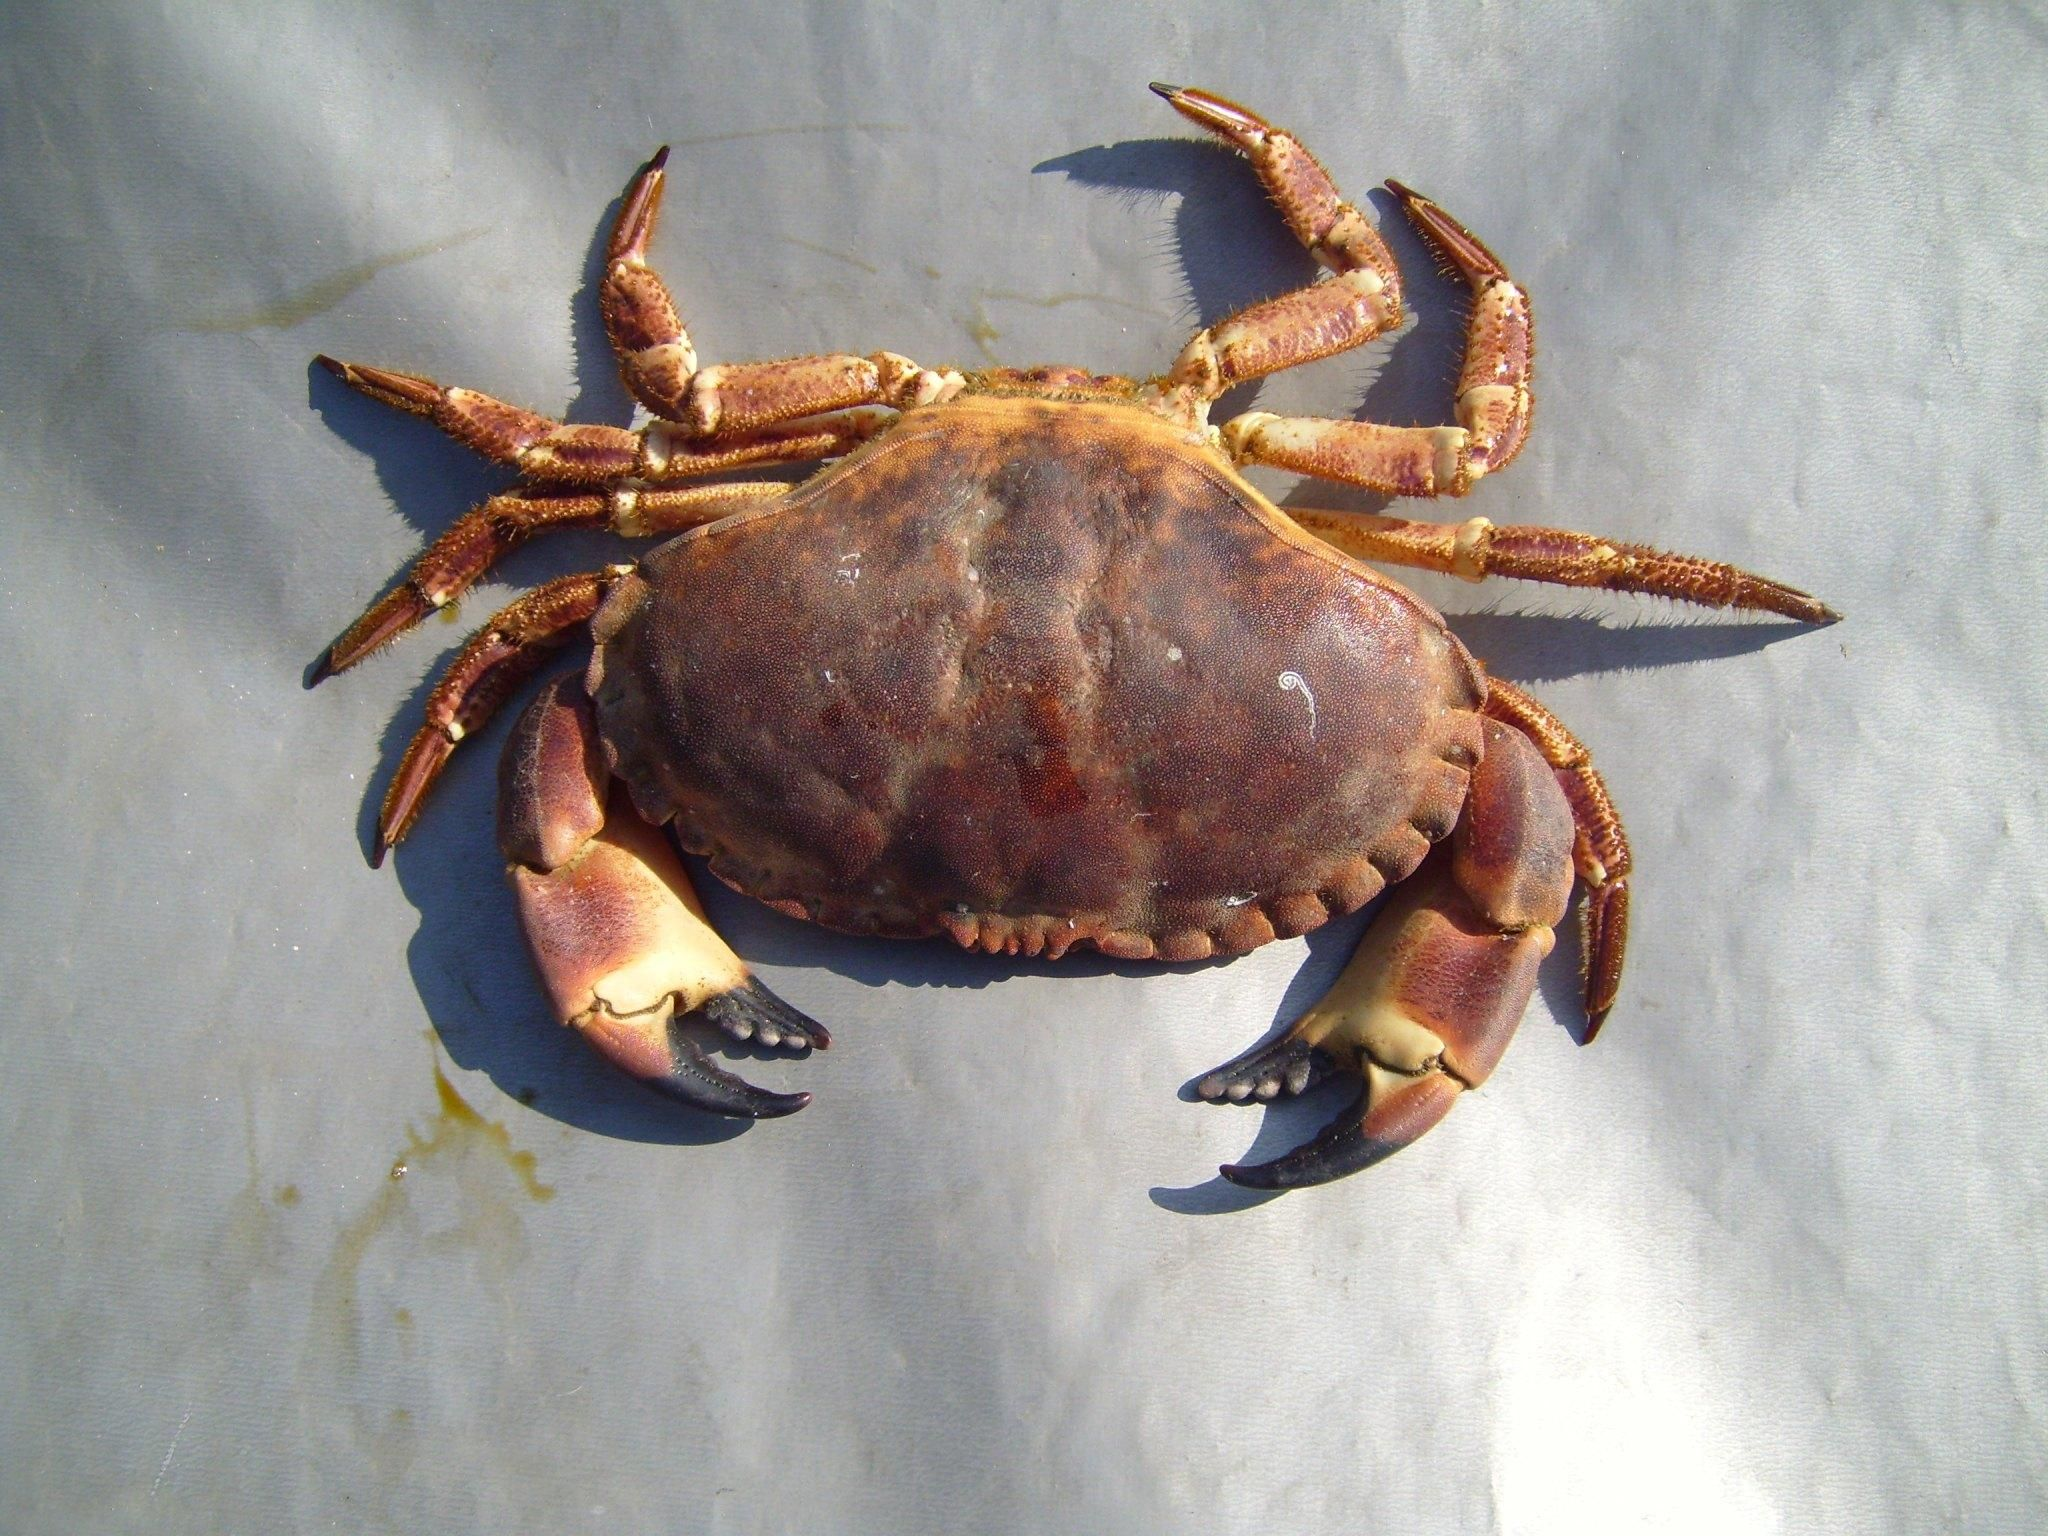 File:Arthropods crab.jpg